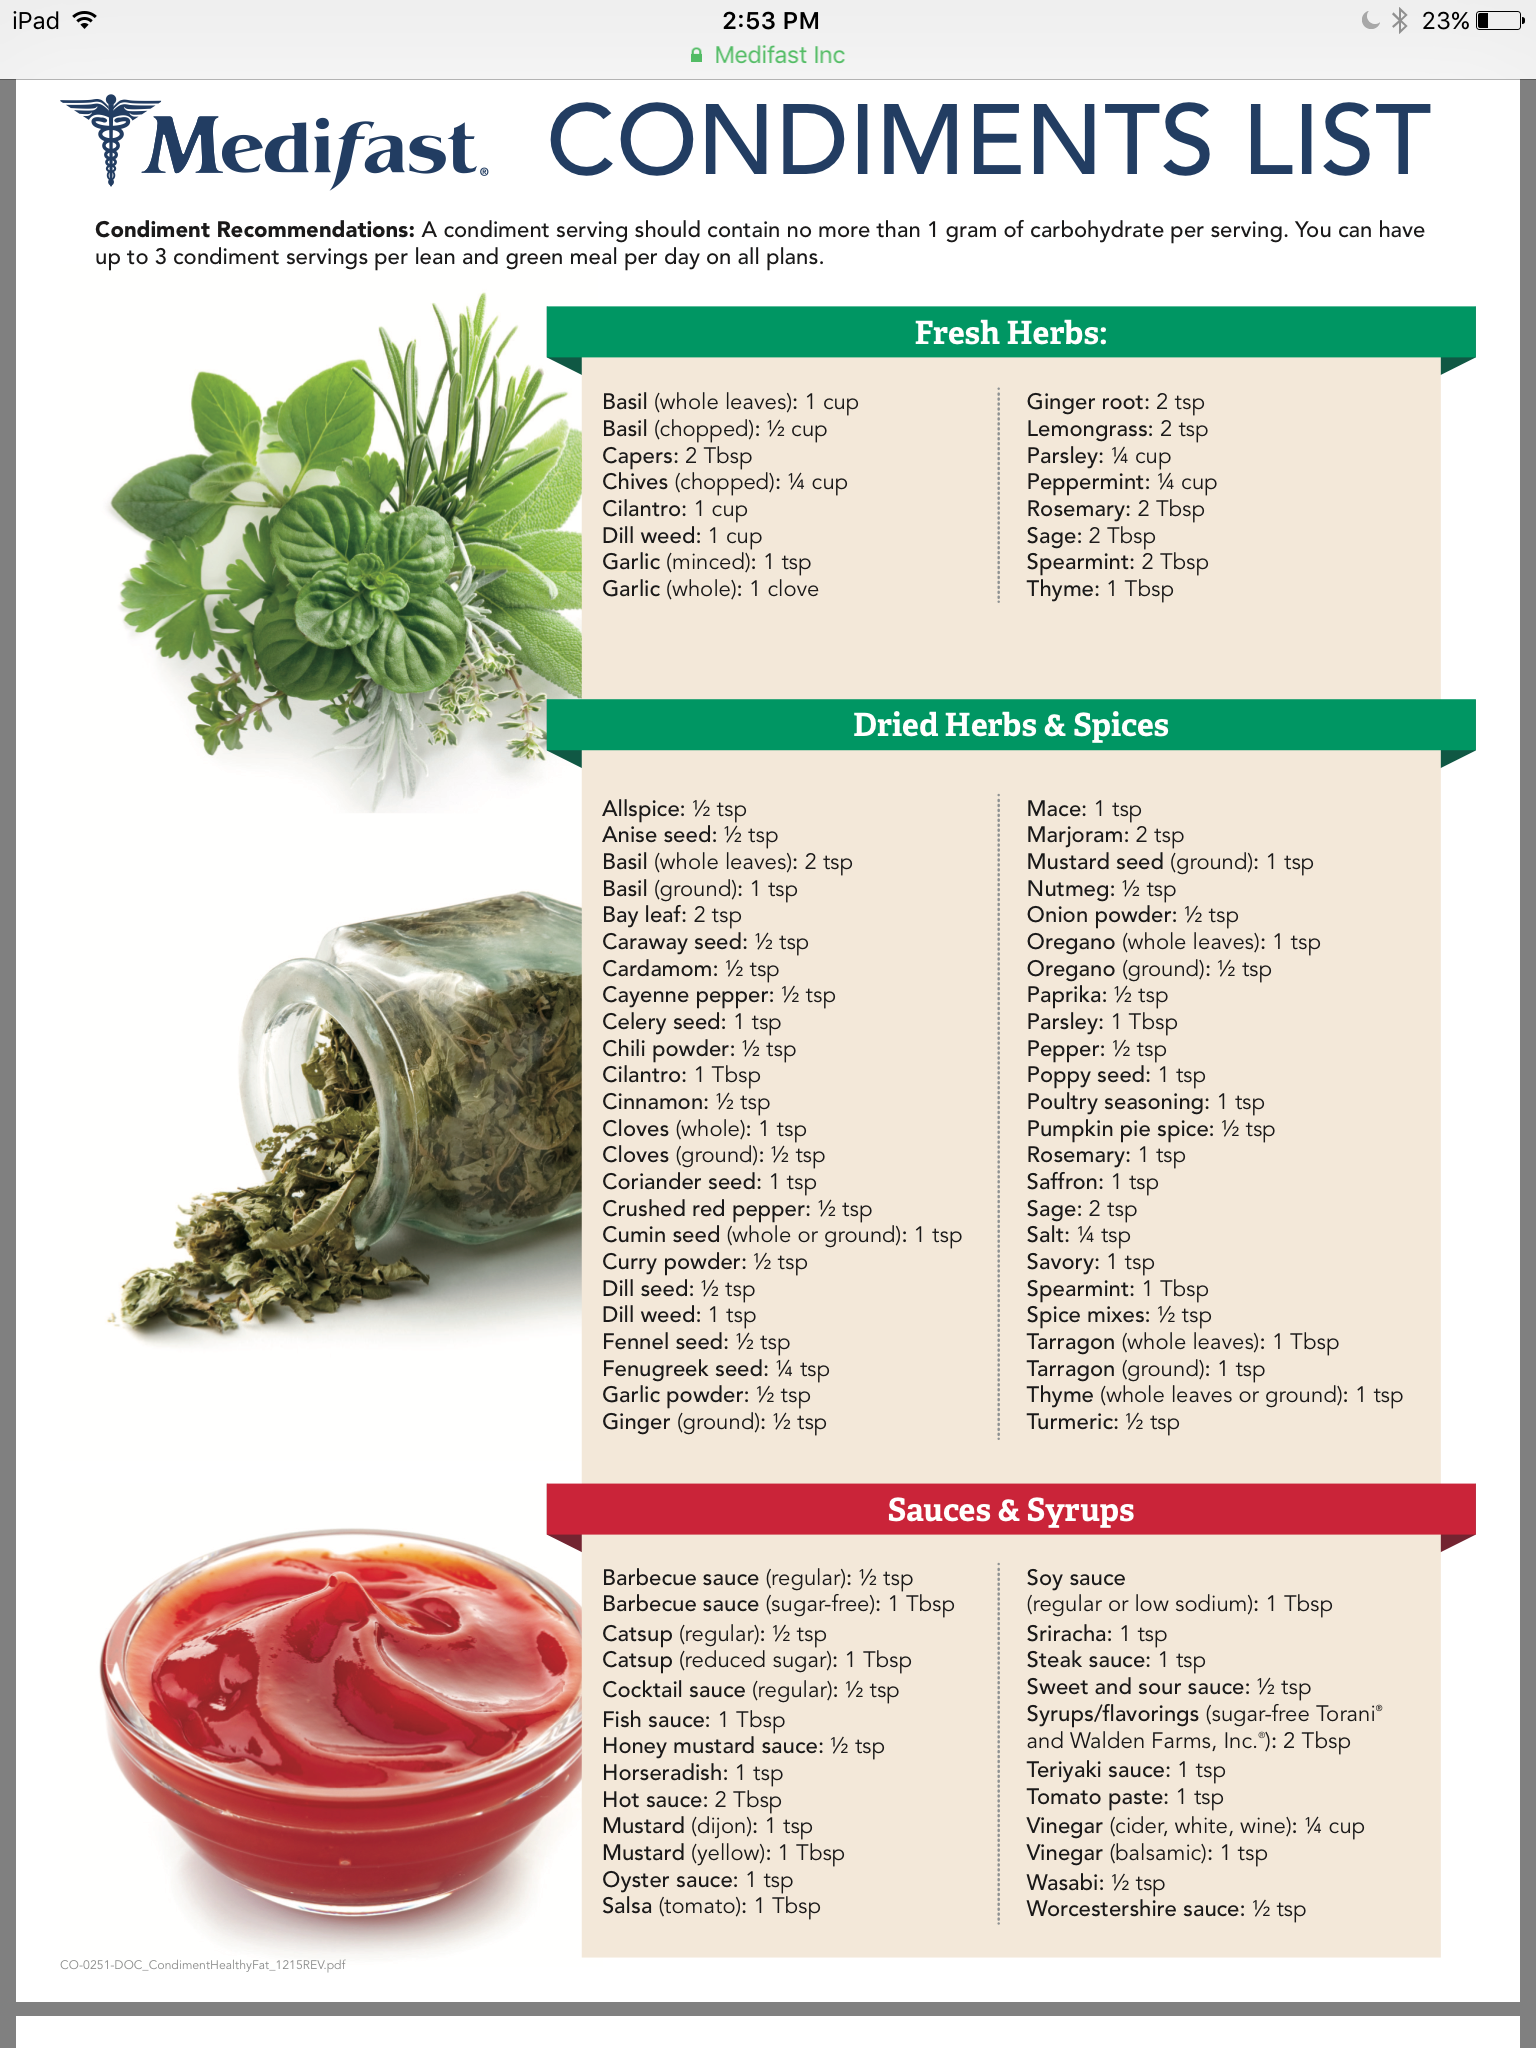 optavia diet plan vegetables